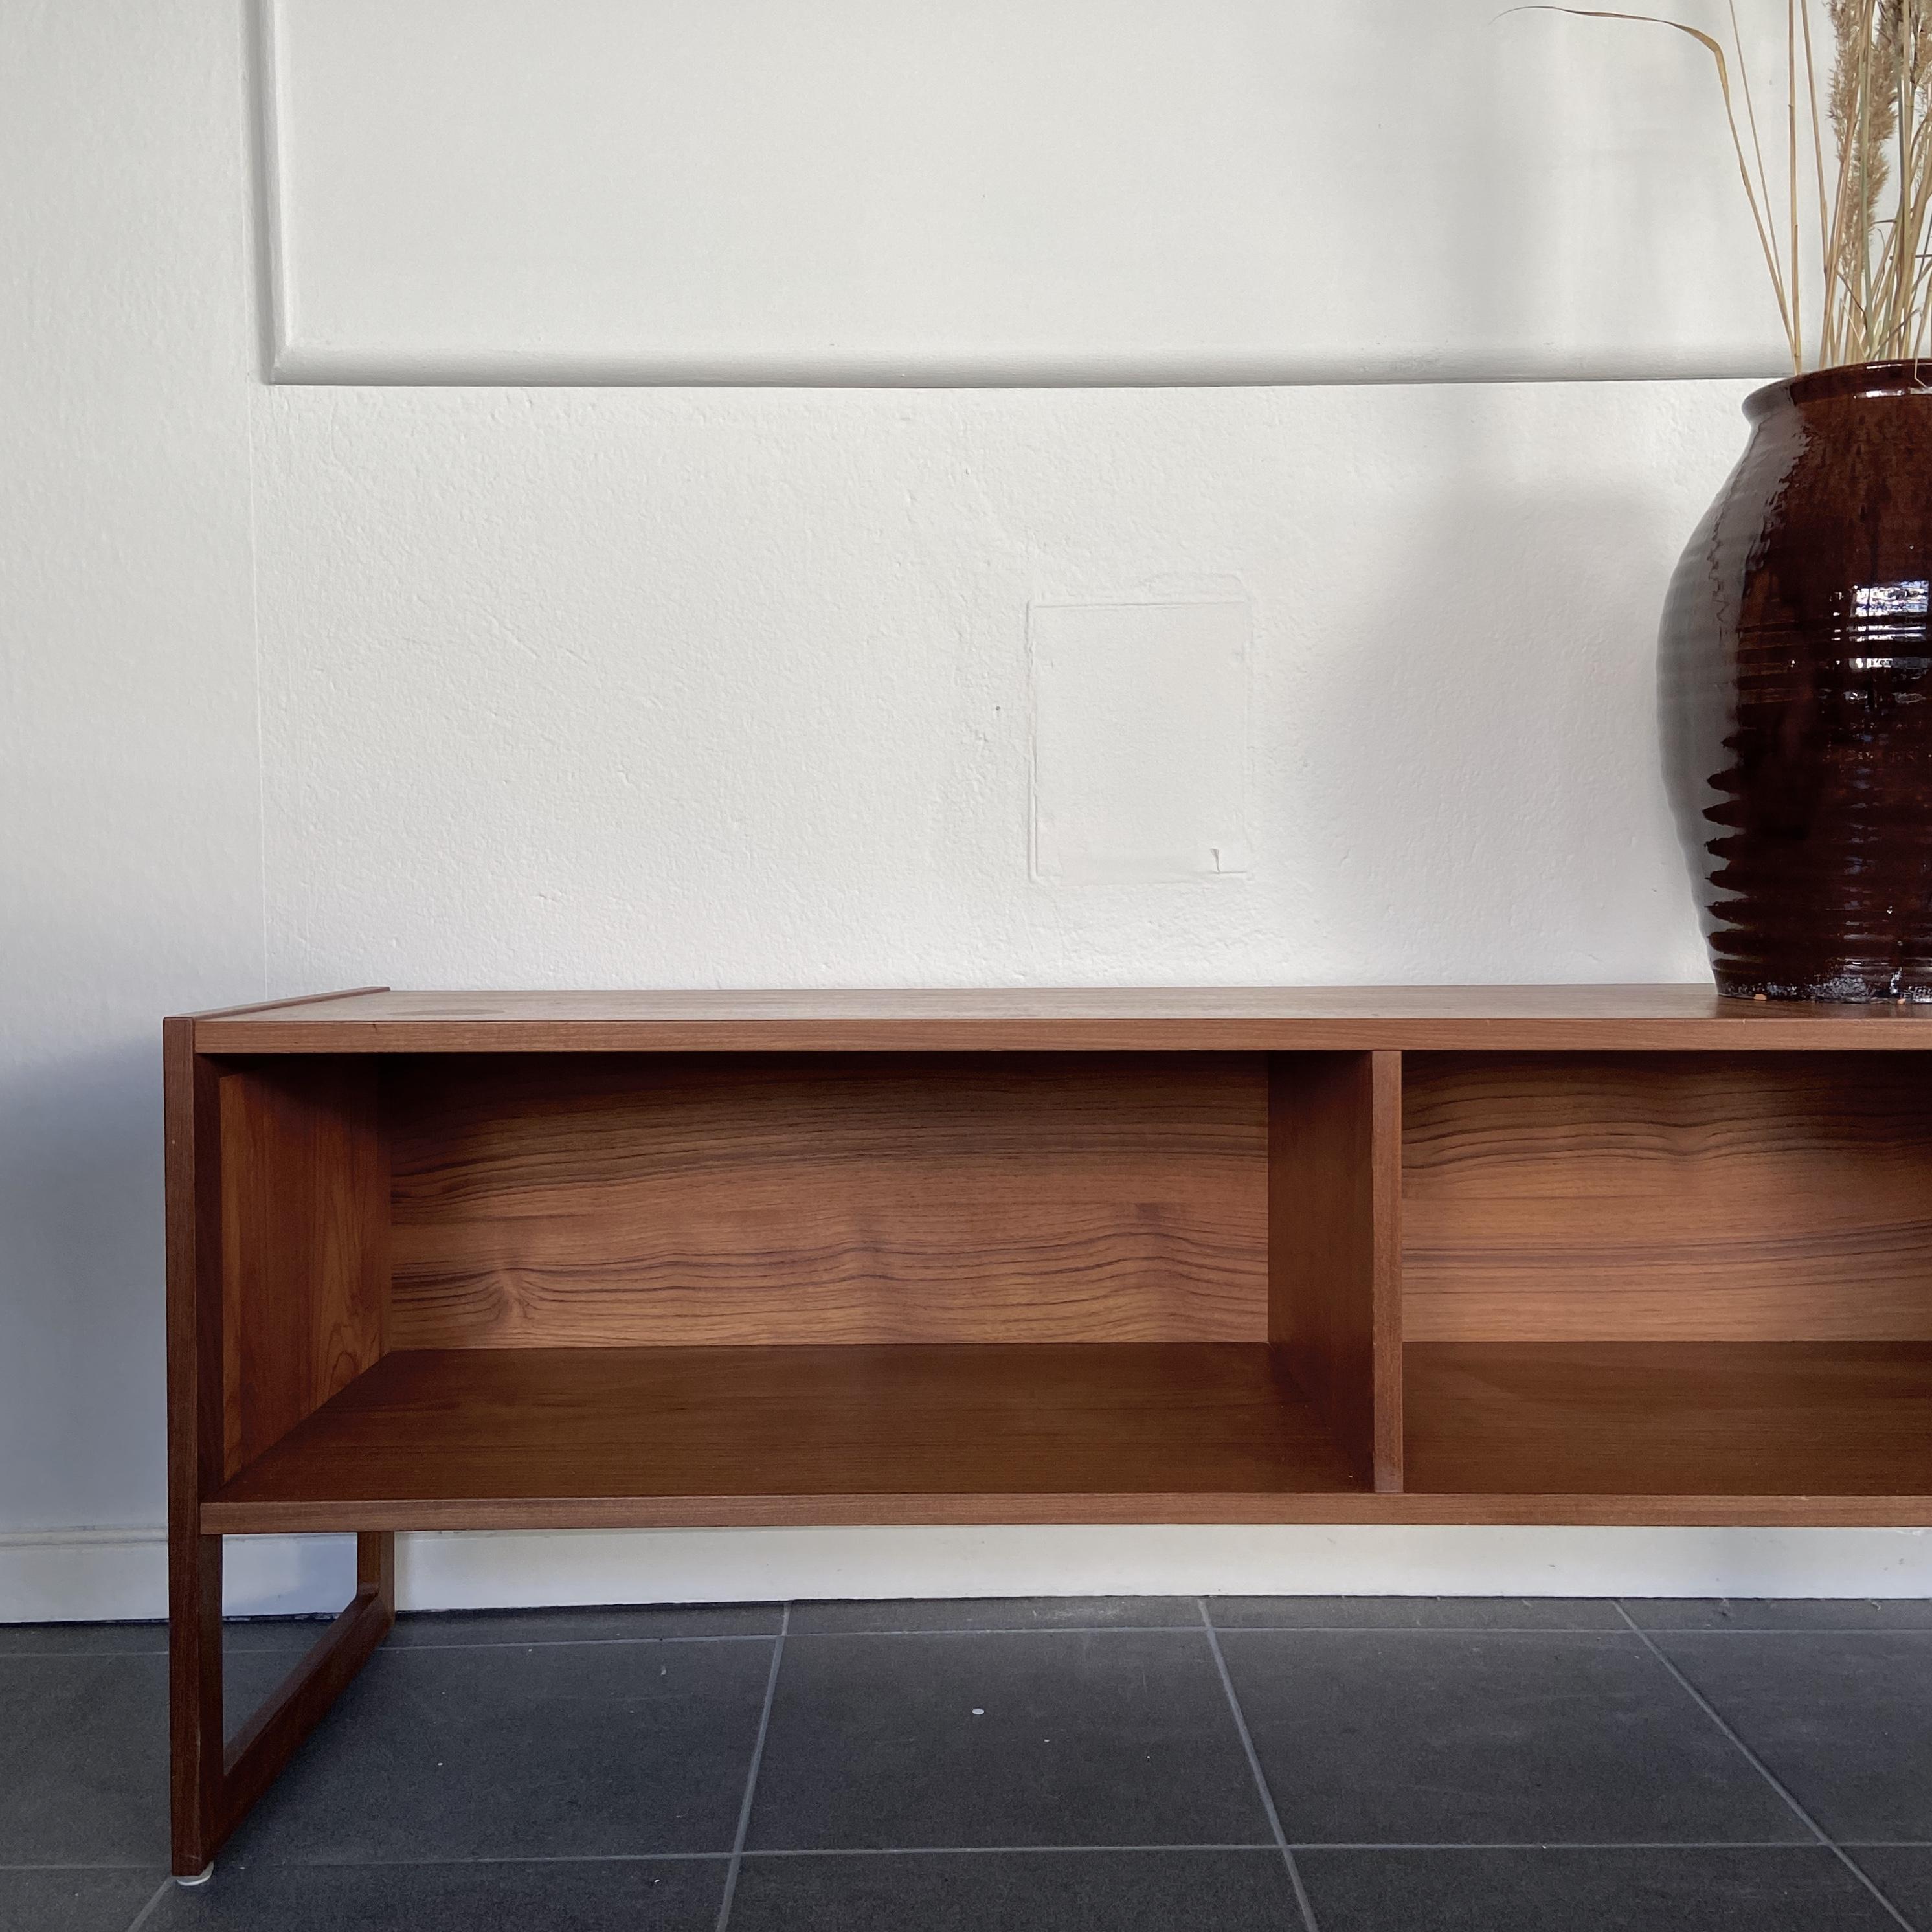 Sideboard, Arne Wahl-Iversen